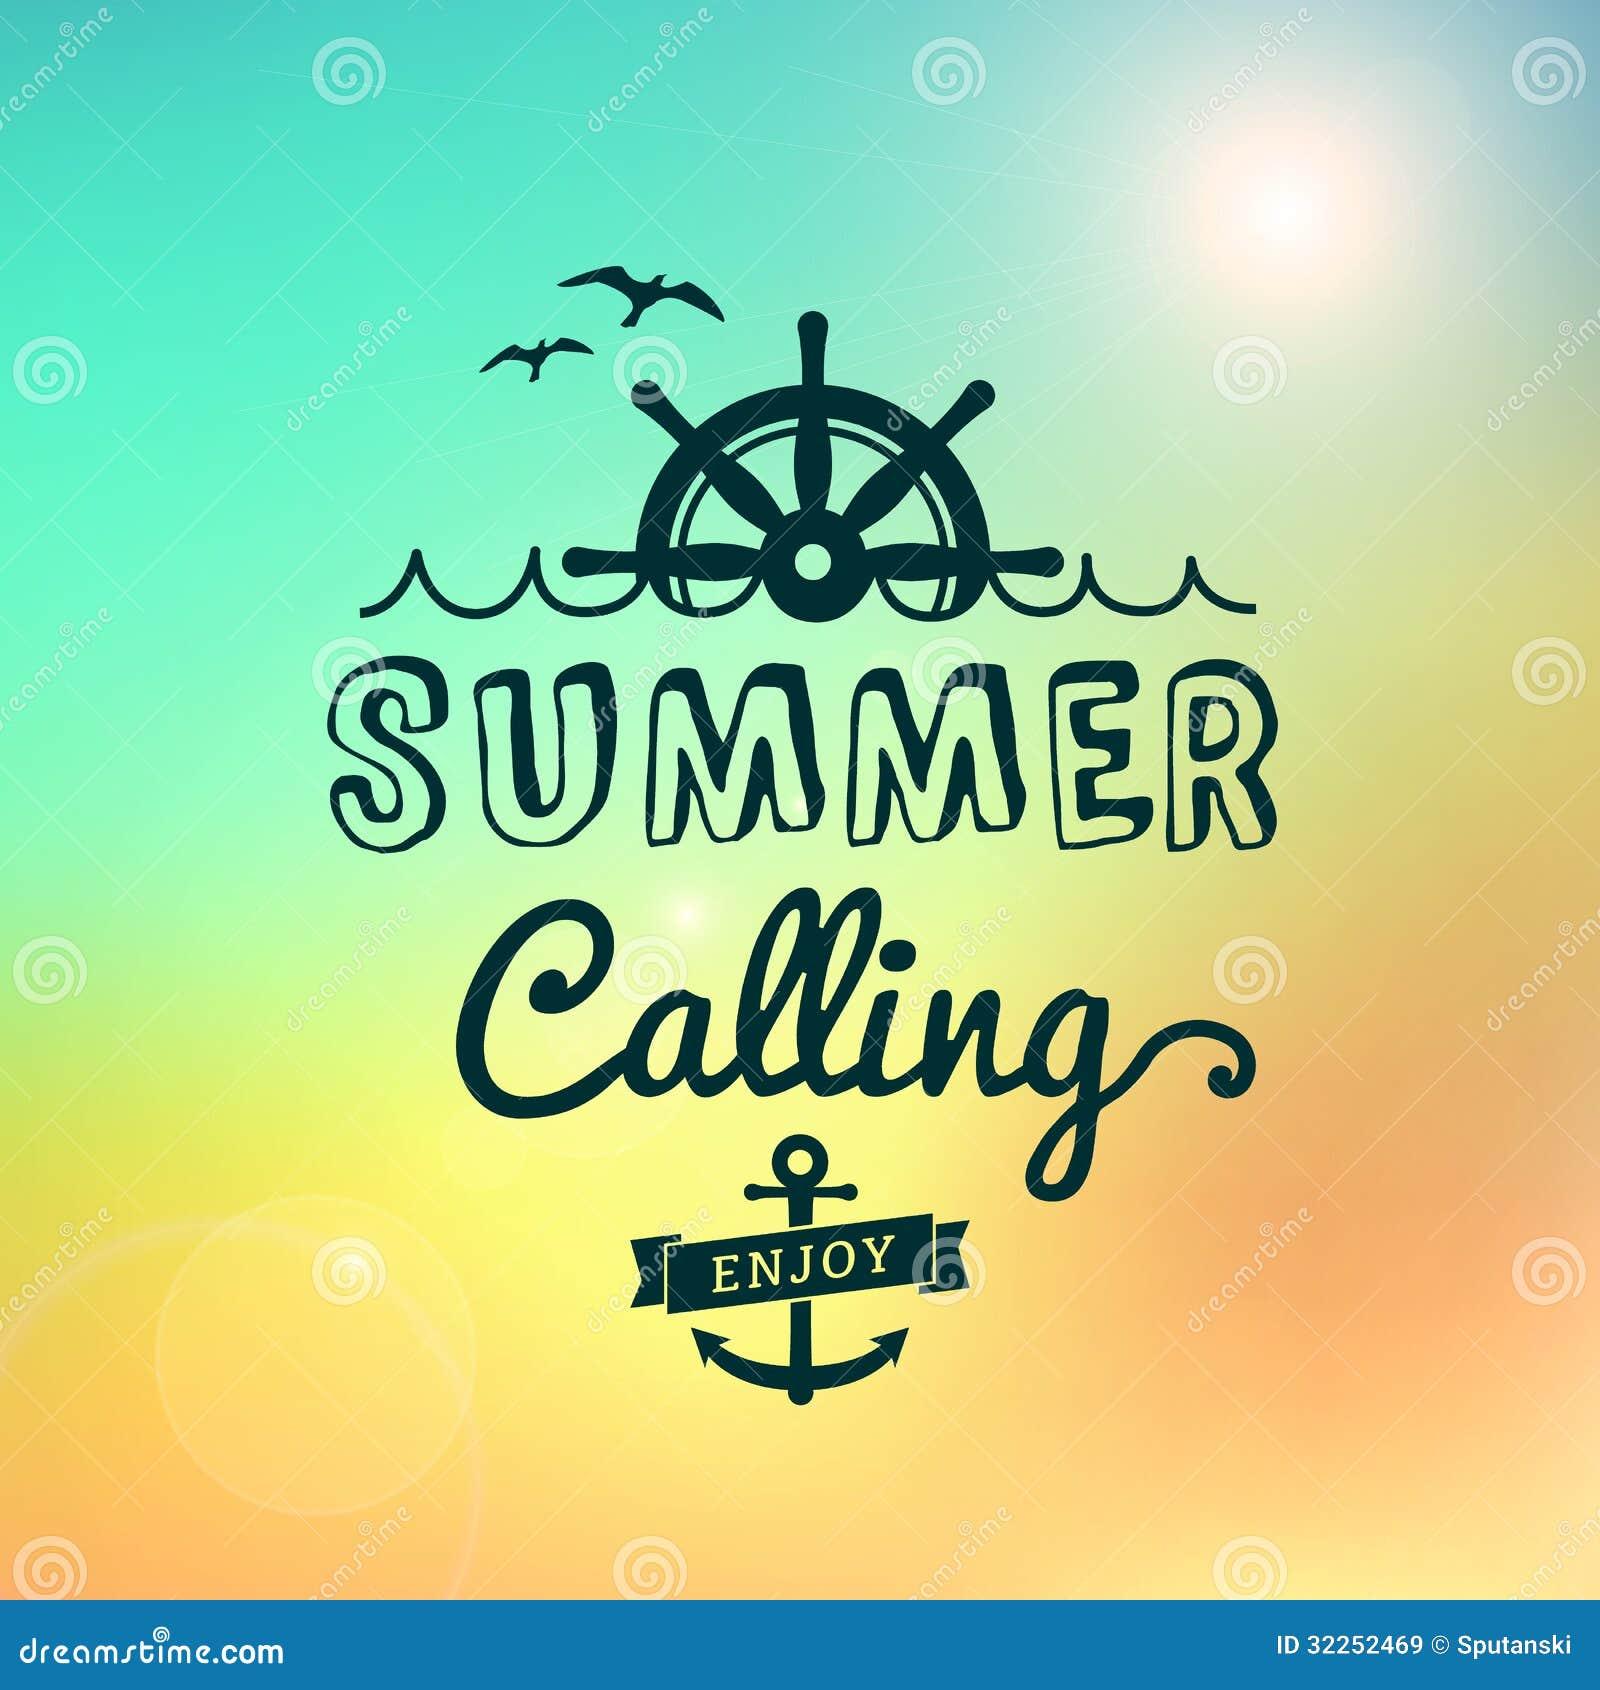 Enjoy Summer Calling Sunrise Hawaii Vintage Poster Royalty